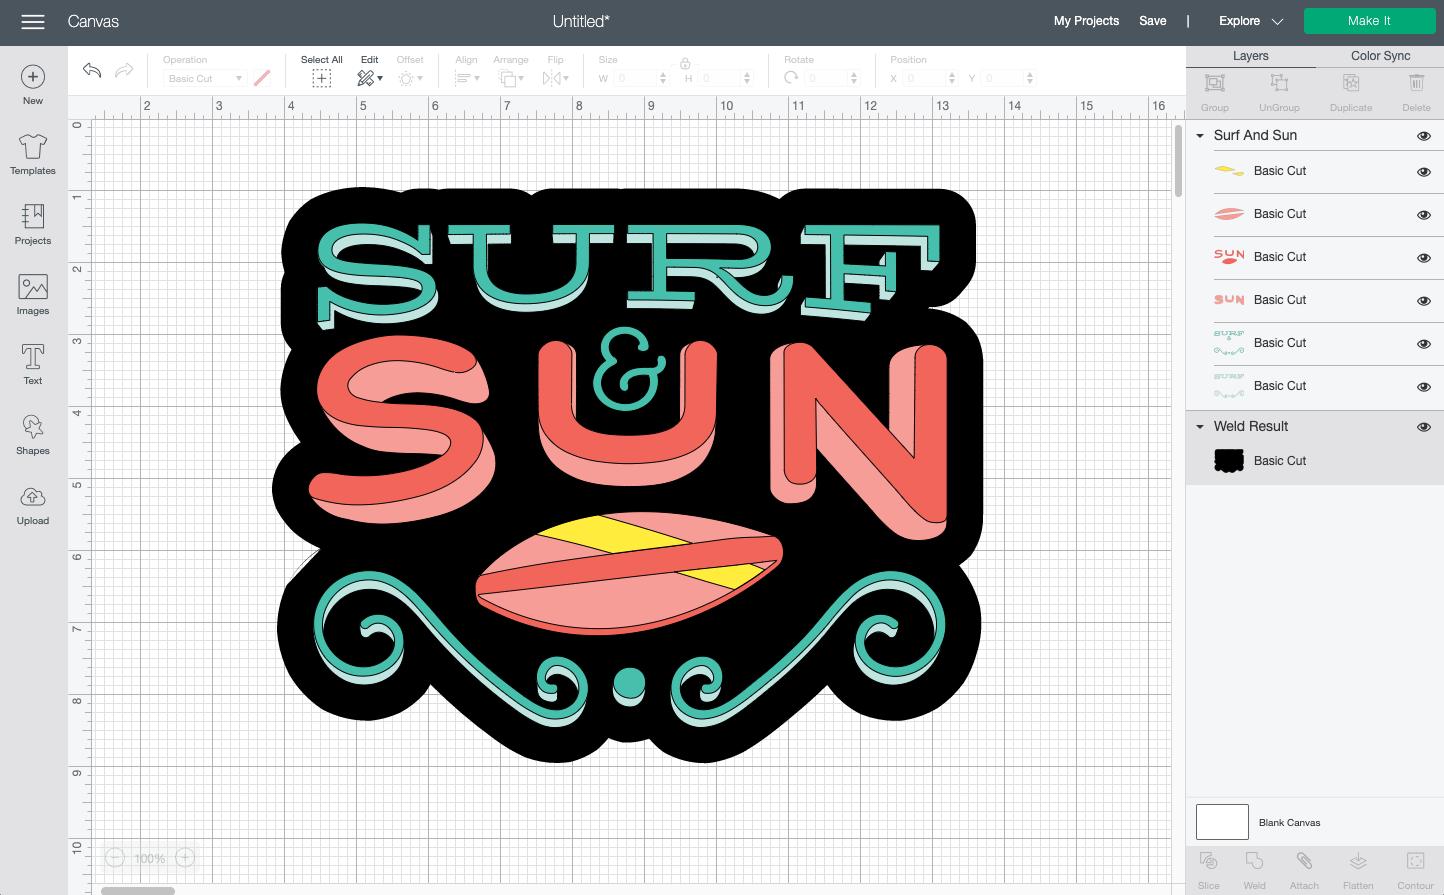 Cricut Design Space: Final surf and sun image